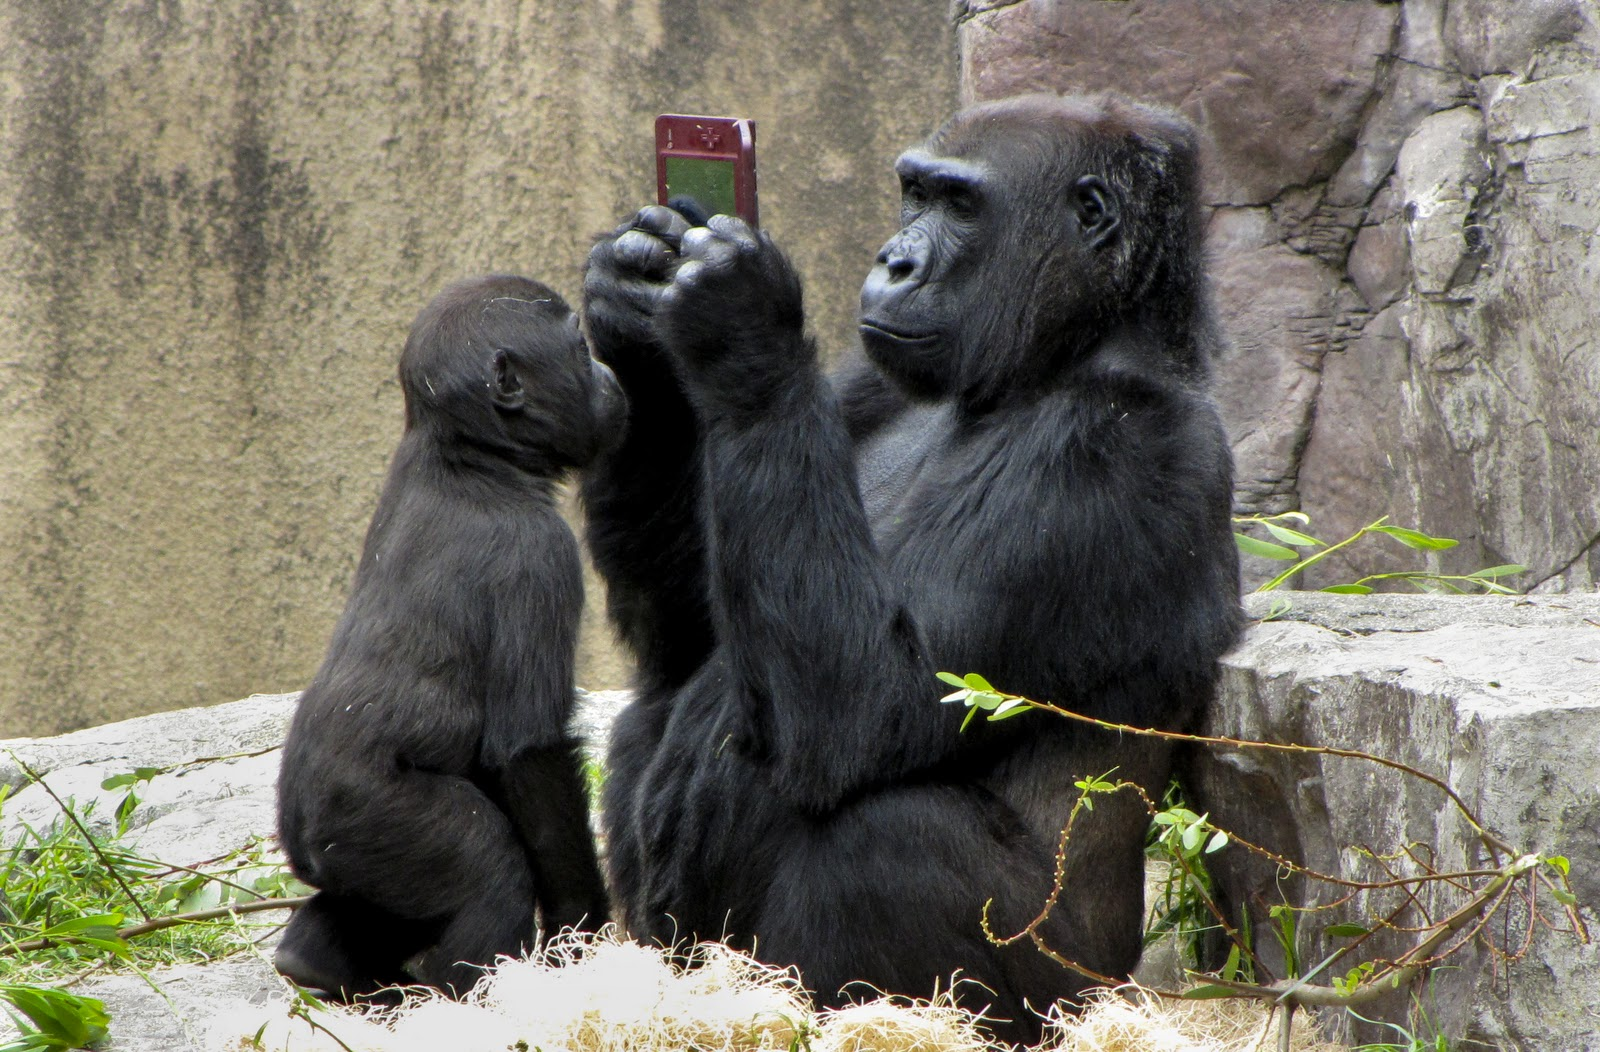 http://4.bp.blogspot.com/-ingPkc_orj4/UAL4UkadGjI/AAAAAAAAQAI/7BcBs_NHqPg/s1600/gorilla-playing-nintendo-003.jpg